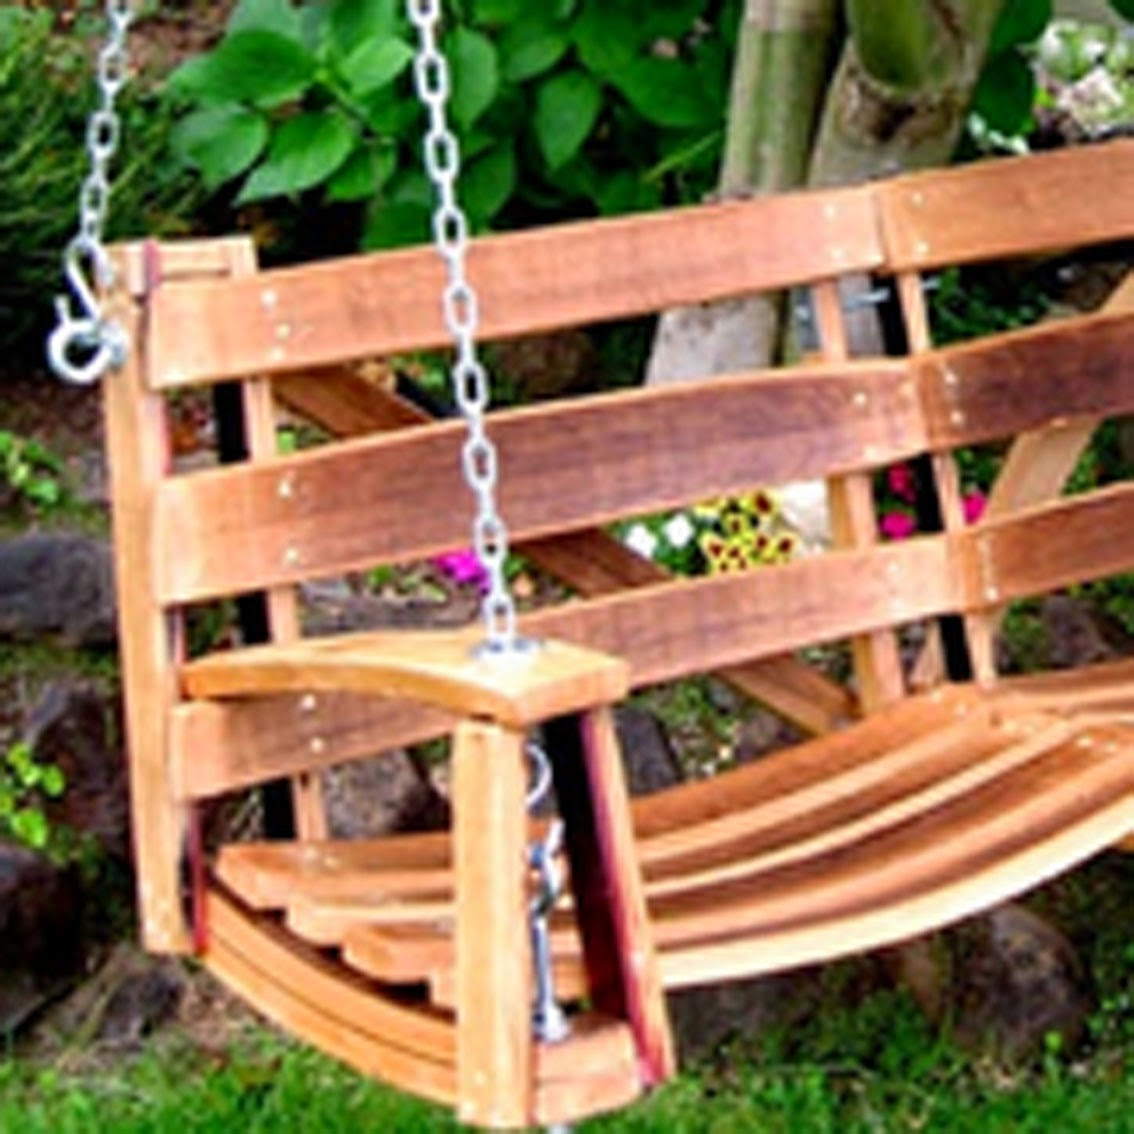 Botte diventa dondolo panchina poltrona da giardino fai - Aiuole giardino fai da te ...